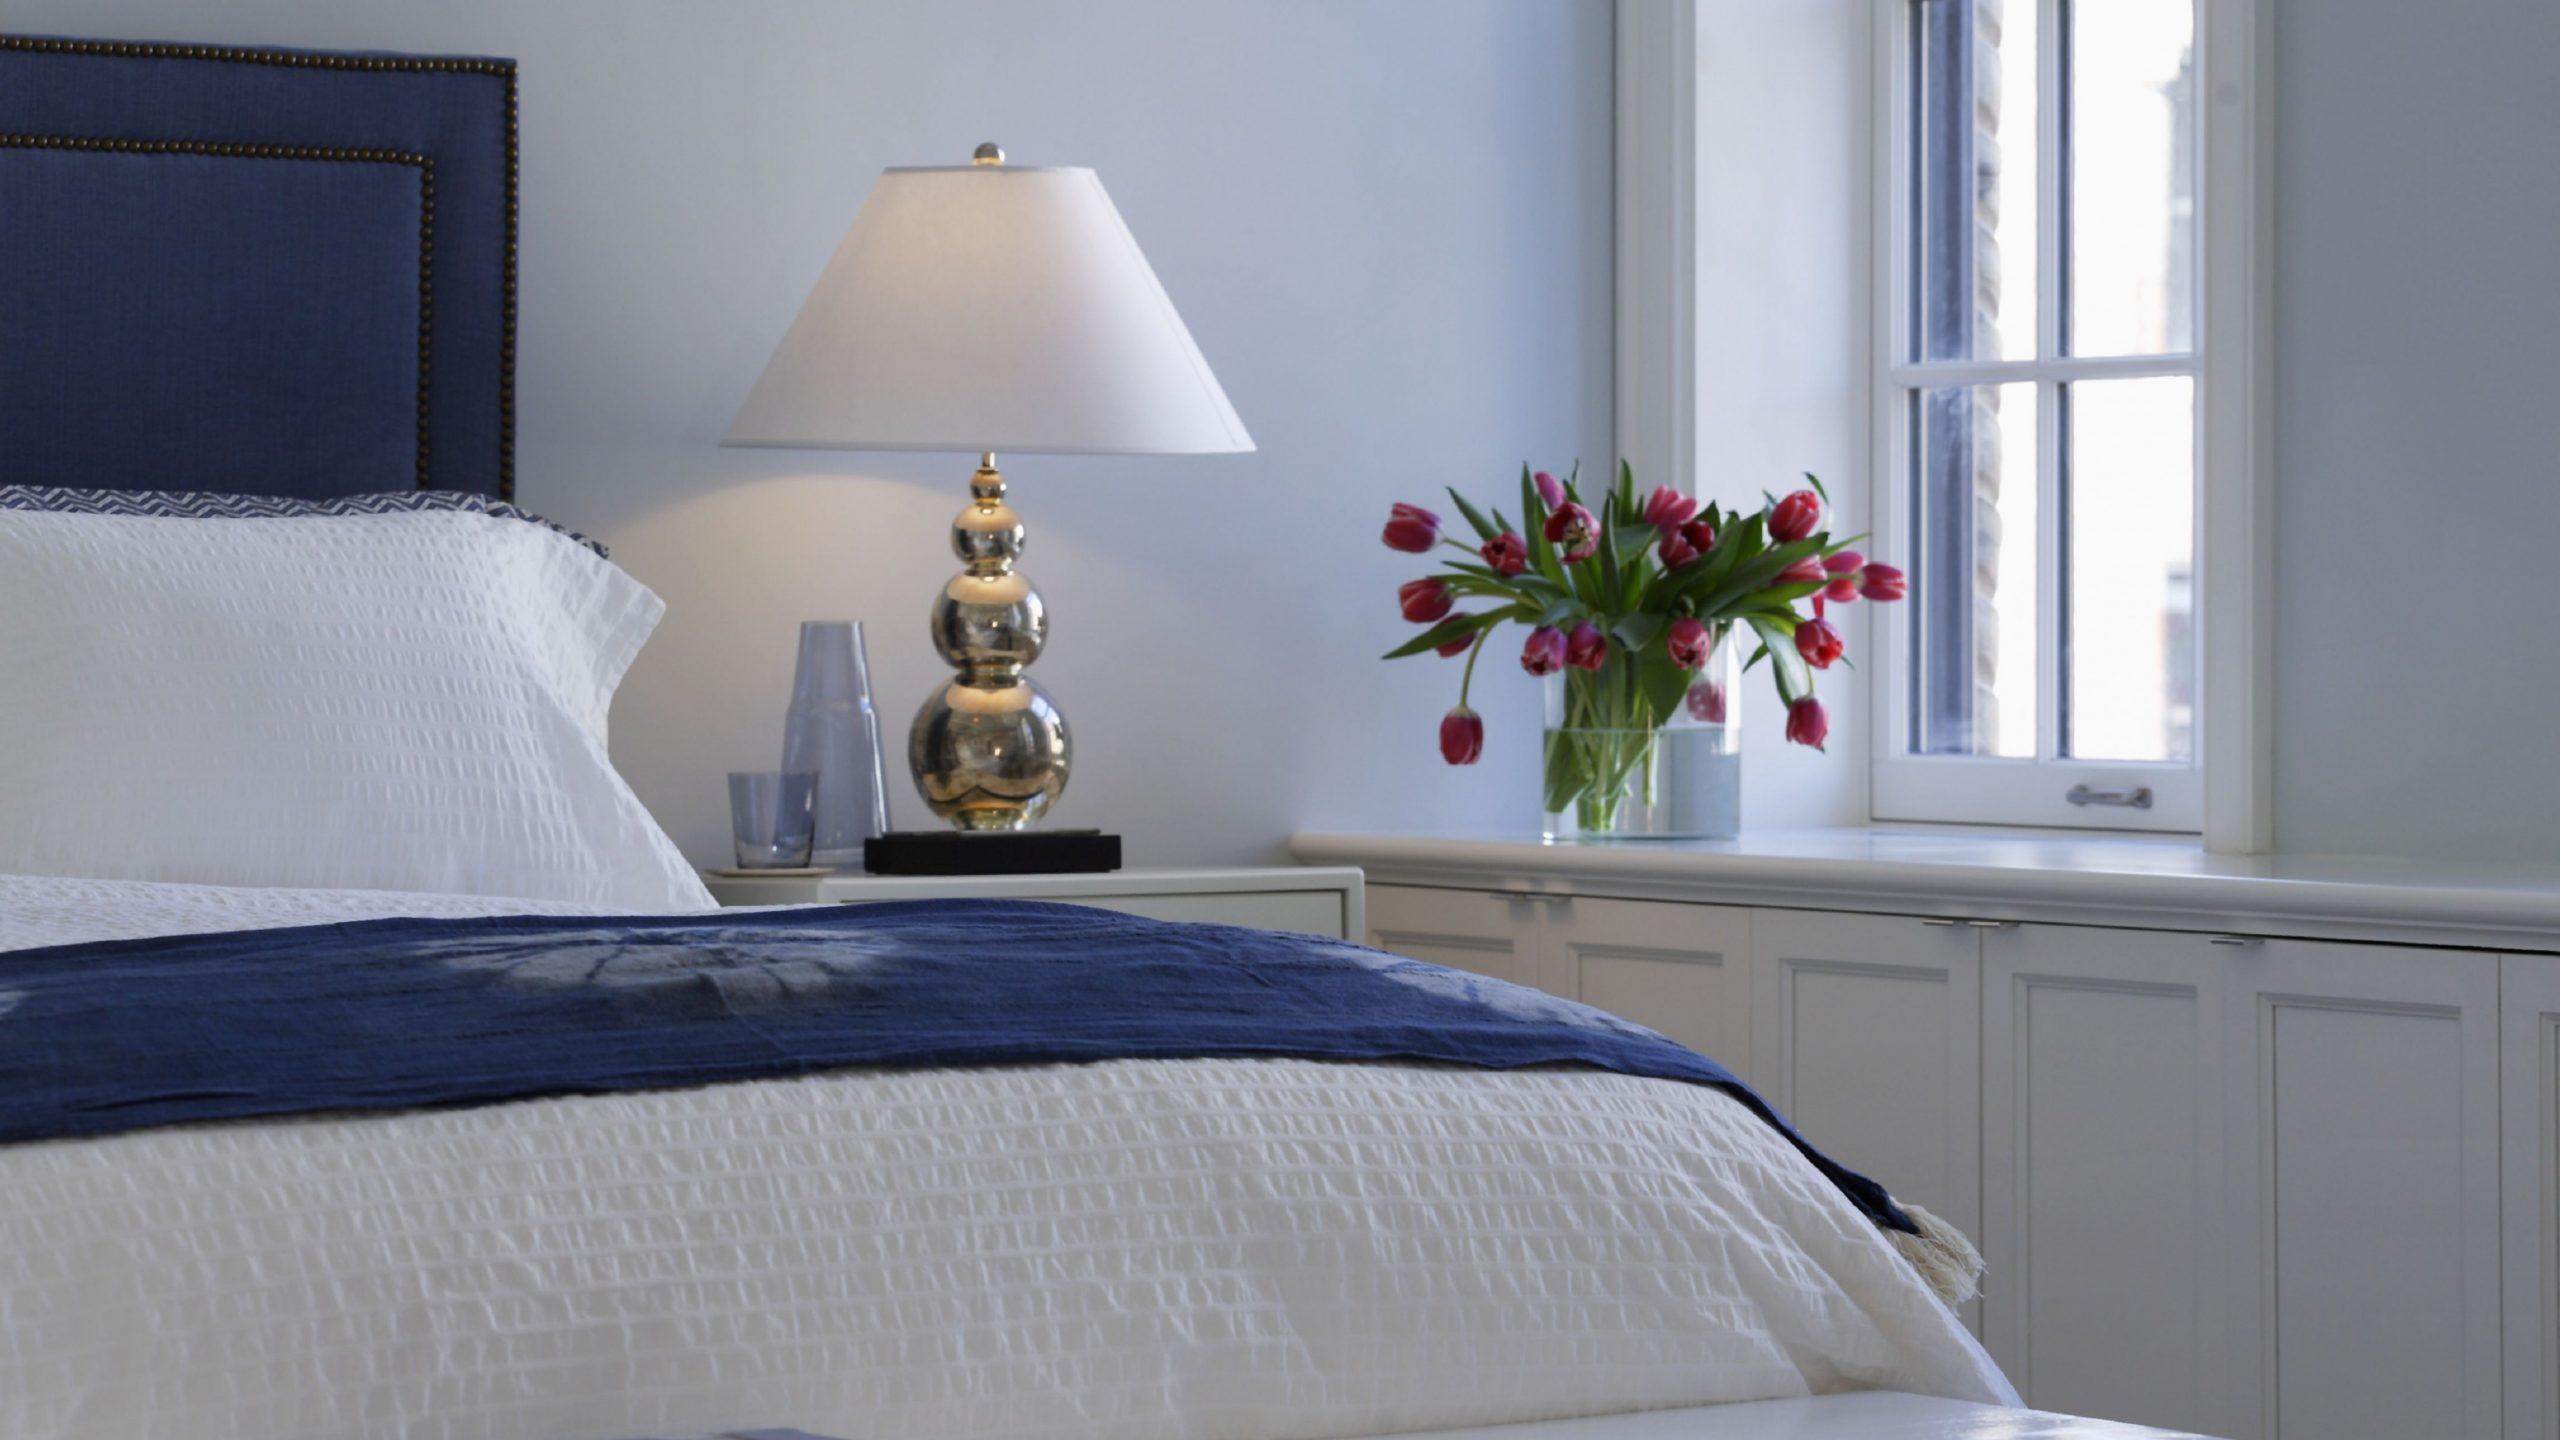 11 Stylish Minimalist Bedrooms With Personality - Bedroom Ideas Minimalist